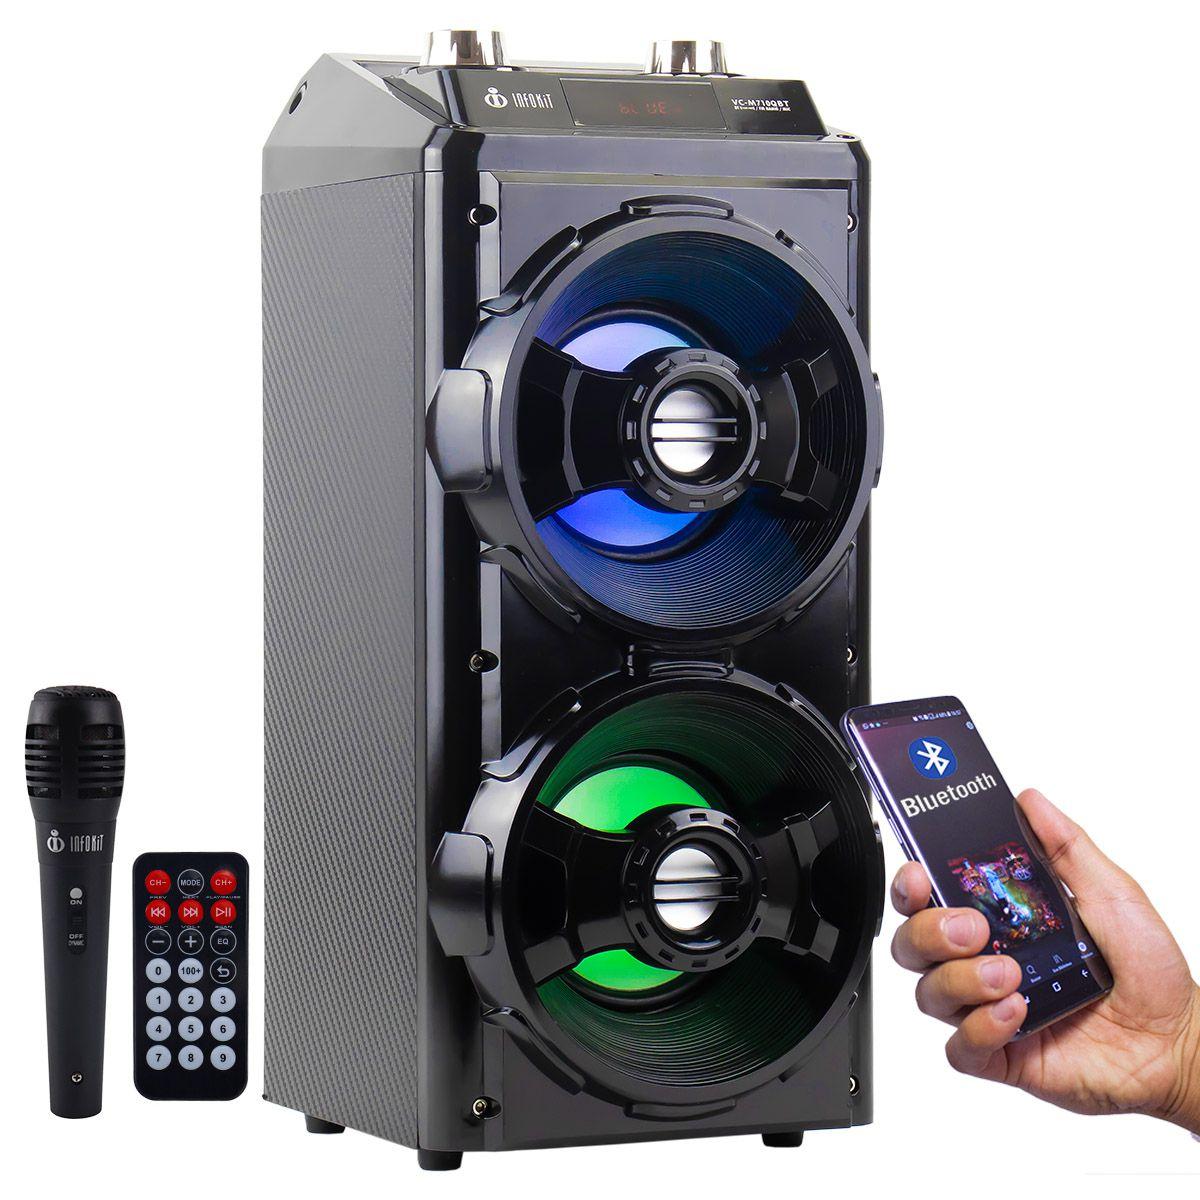 Caixa de Som Bluetooth 12 Watts Rms Infokit VC-M710QBT c/ Visor SD/USB/FM e Microfone